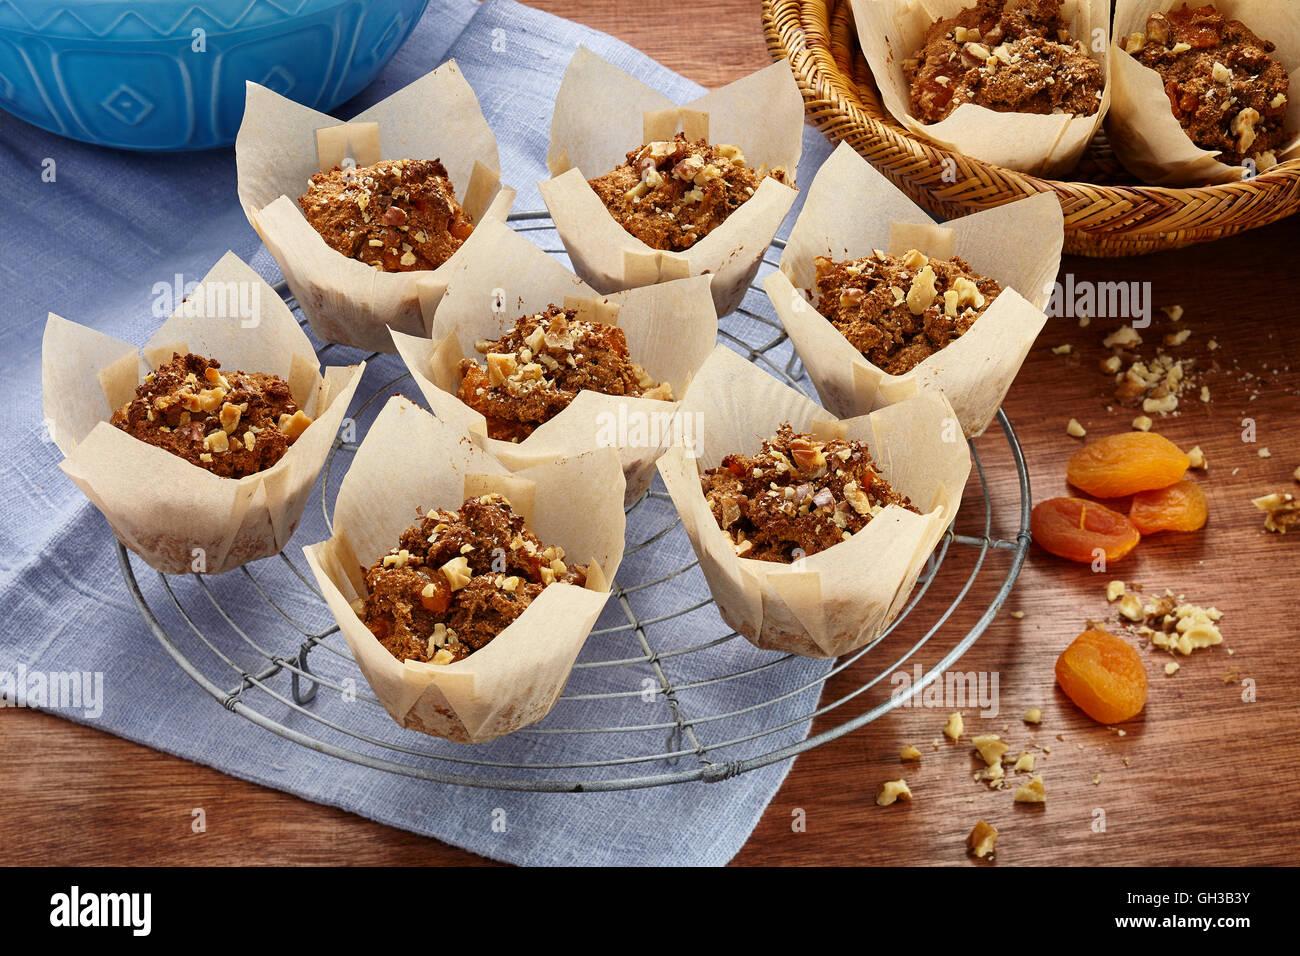 Apricot_muffins - Stock Image